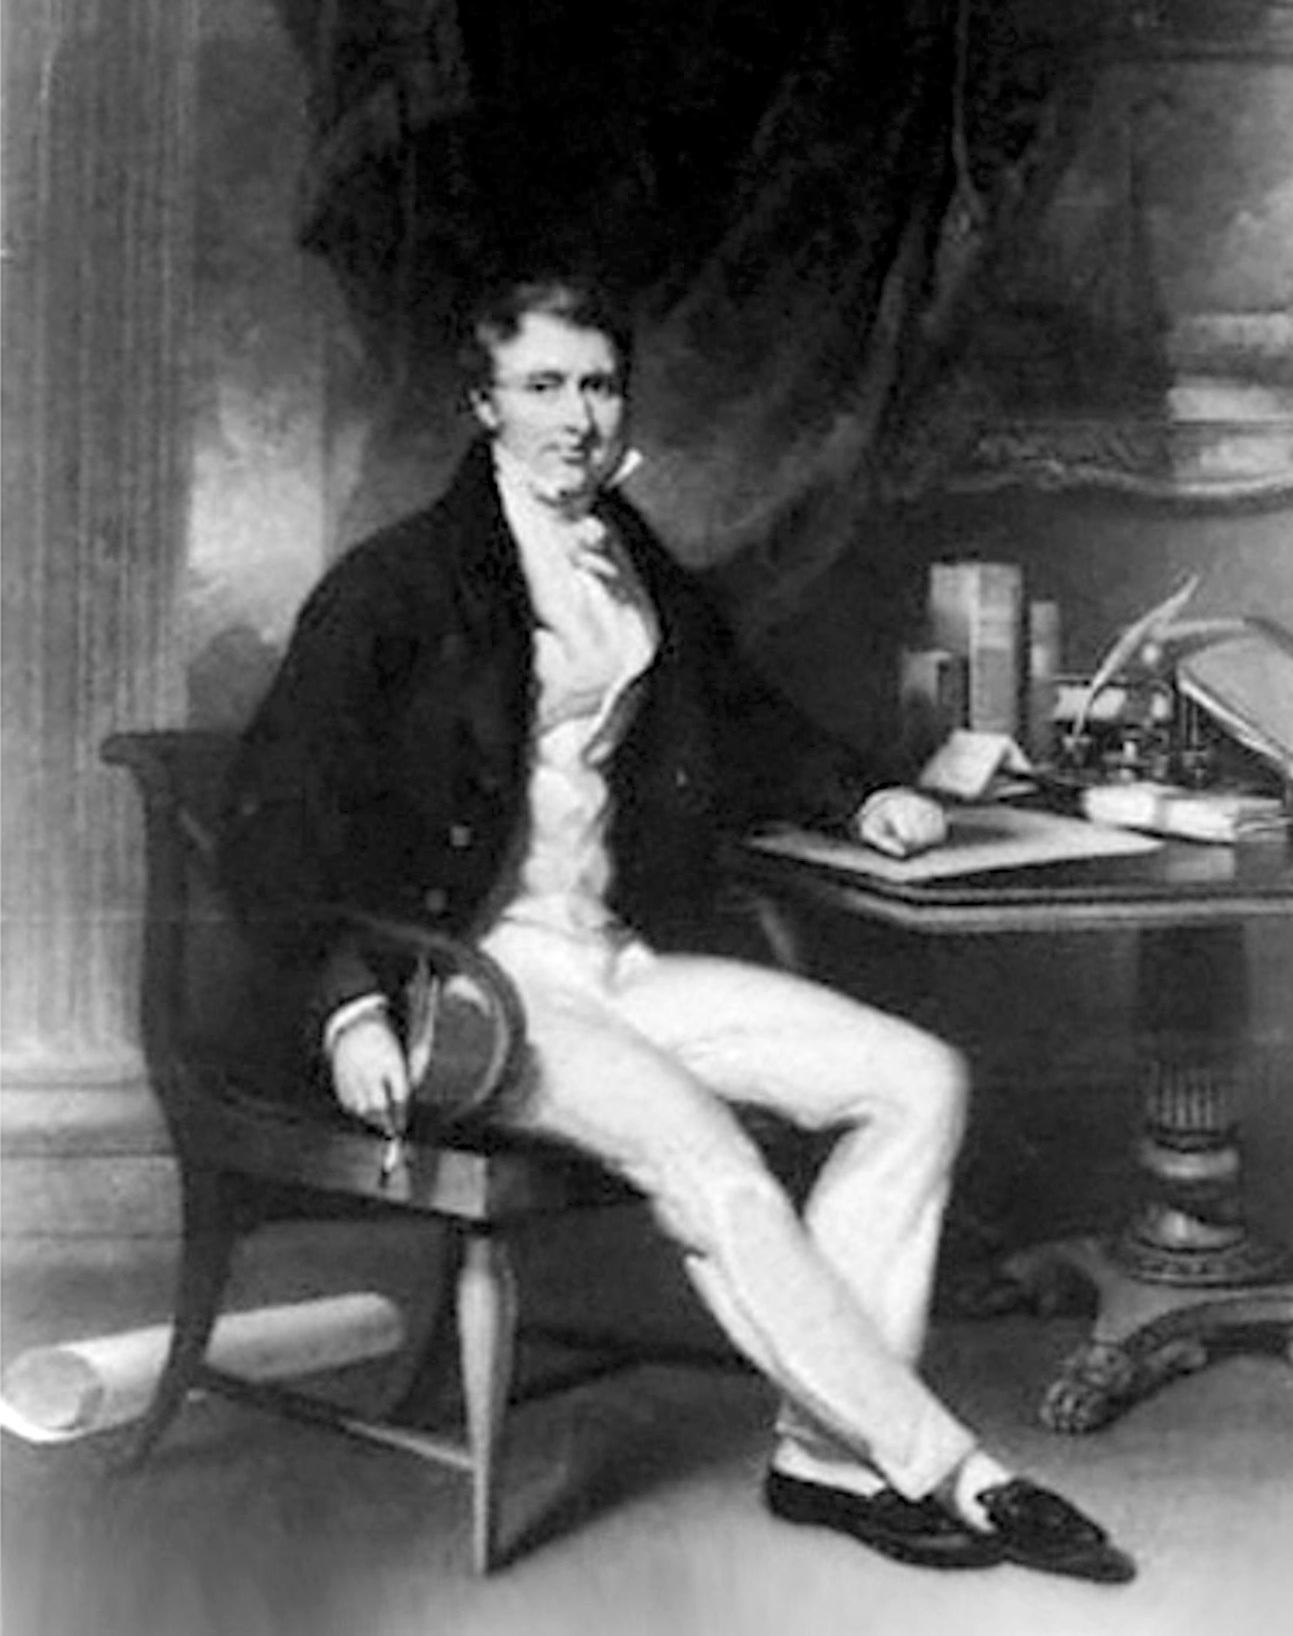 William Jardine    Founder of The Jardine and Matheson Company, Opium smugglers